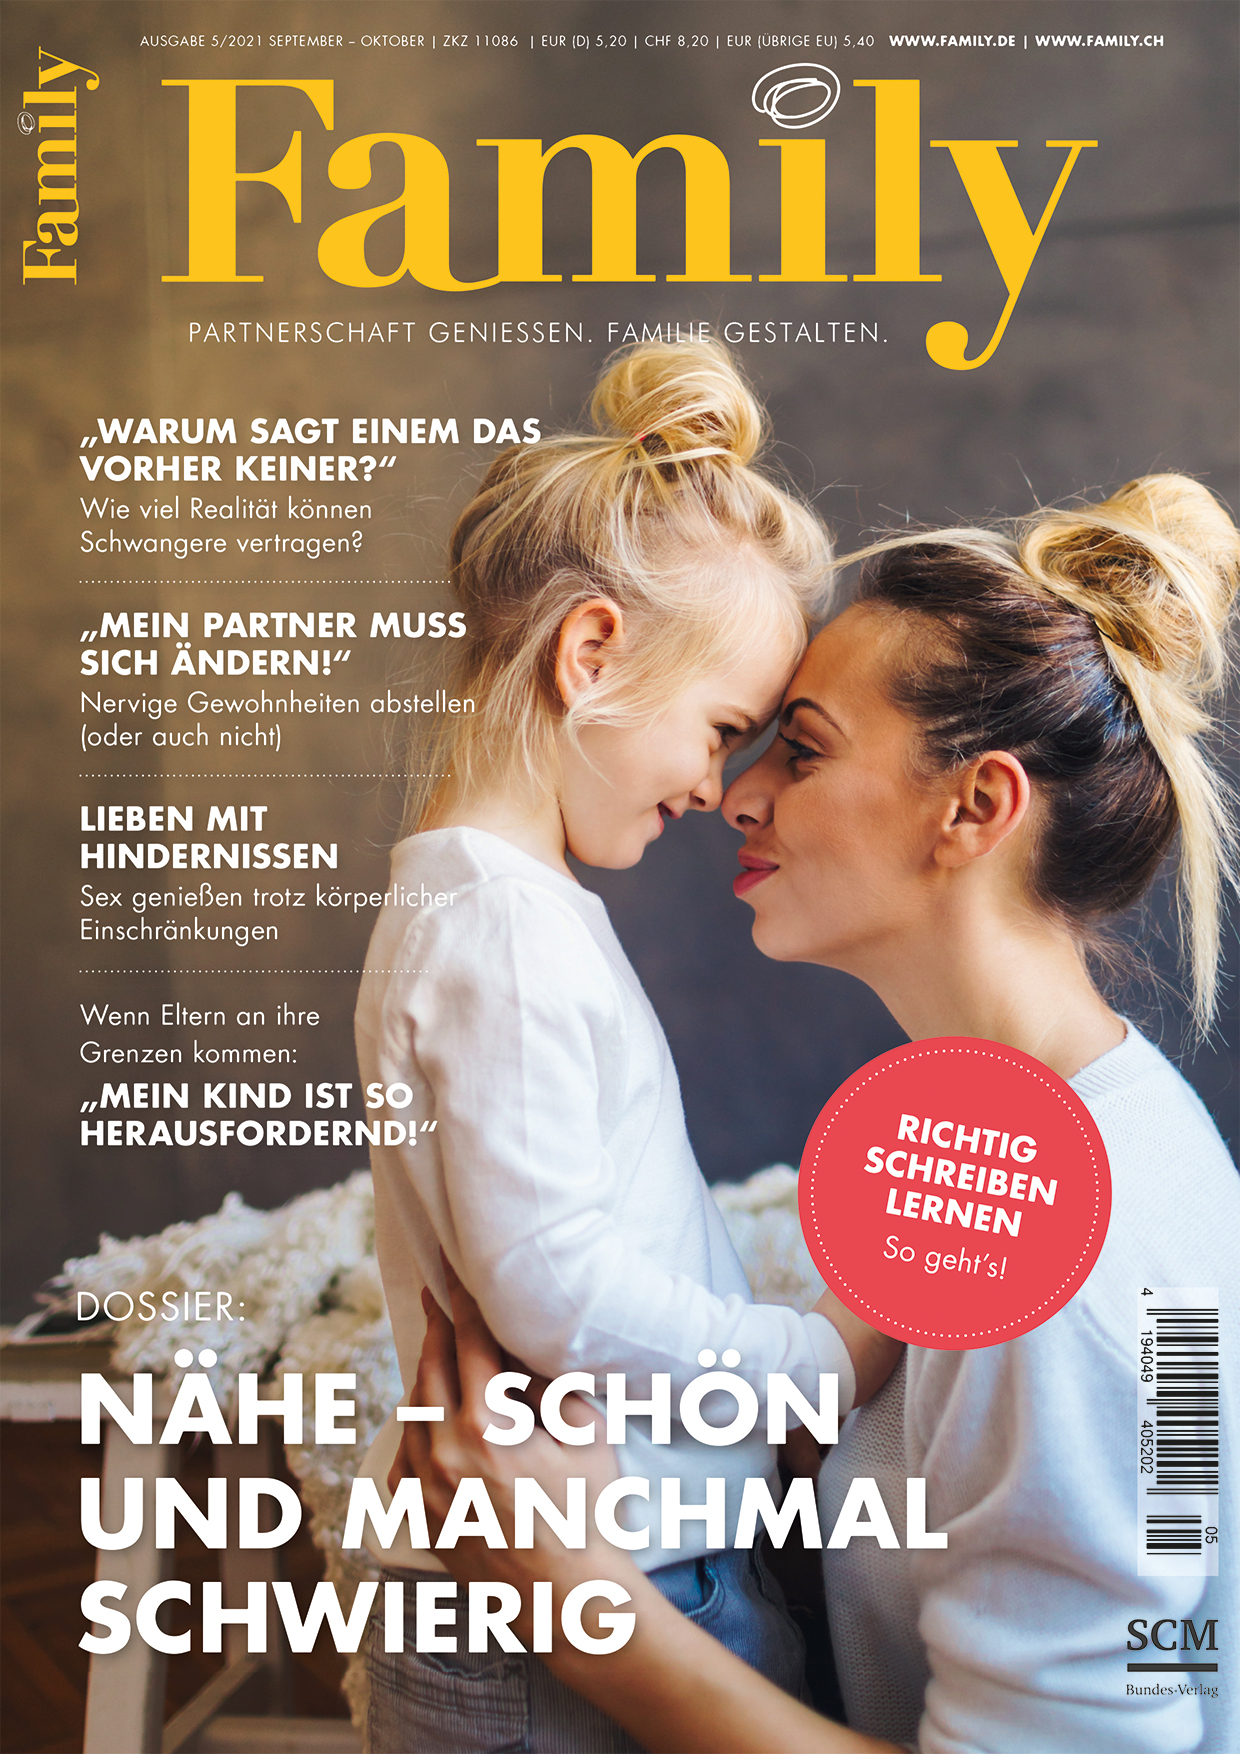 Family | Partnerschaft geniessen. Familie gestalten. | Magazin ...